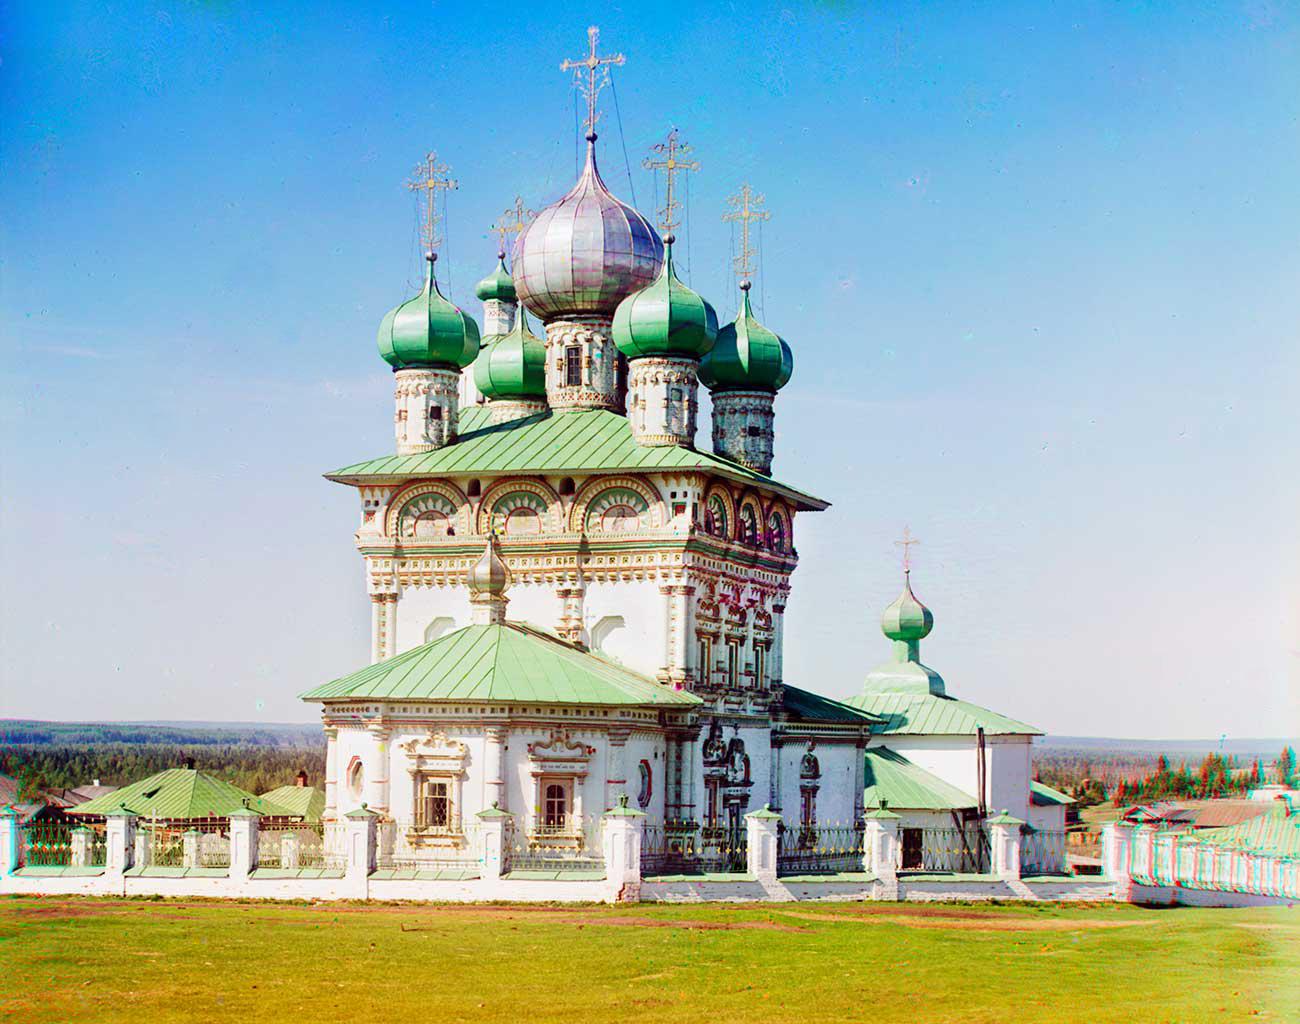 Nyrob. Church of St. Nicholas, northeast view. Photo: 1913 / Sergei Prokudin-Gorsky